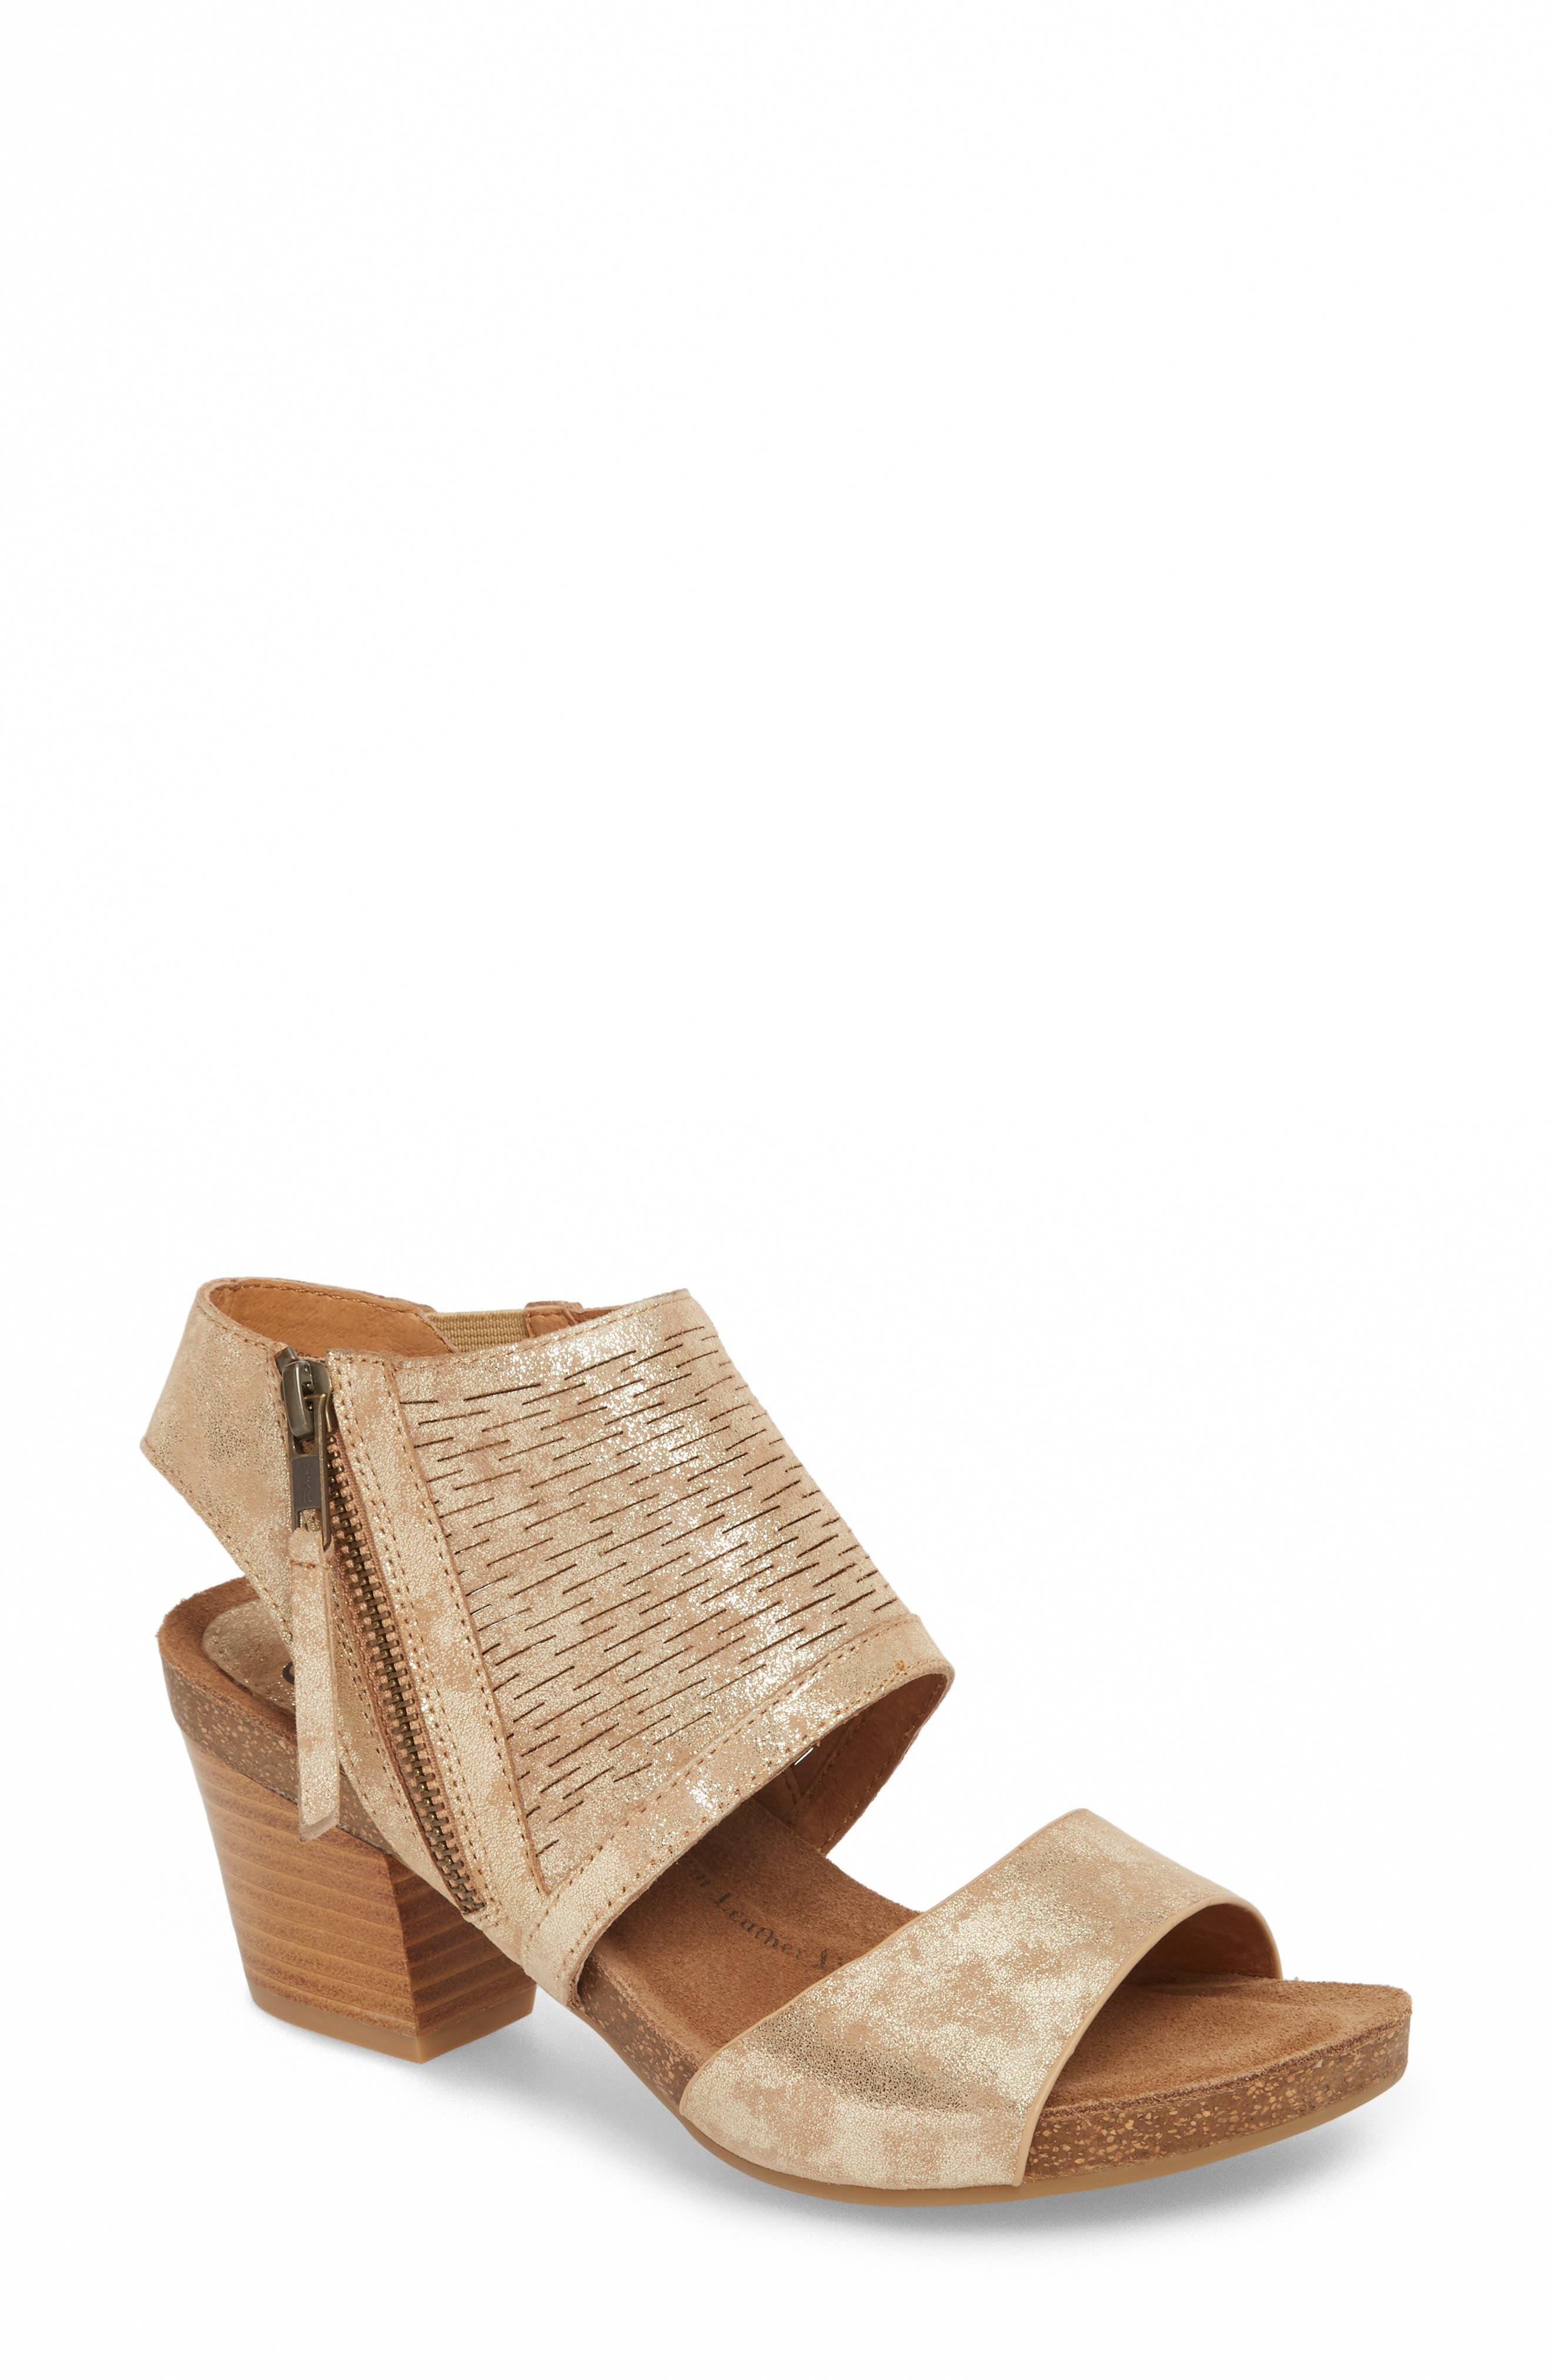 Milan Block Heel Sandal,                         Main,                         color, Platino Distressed Foil Suede